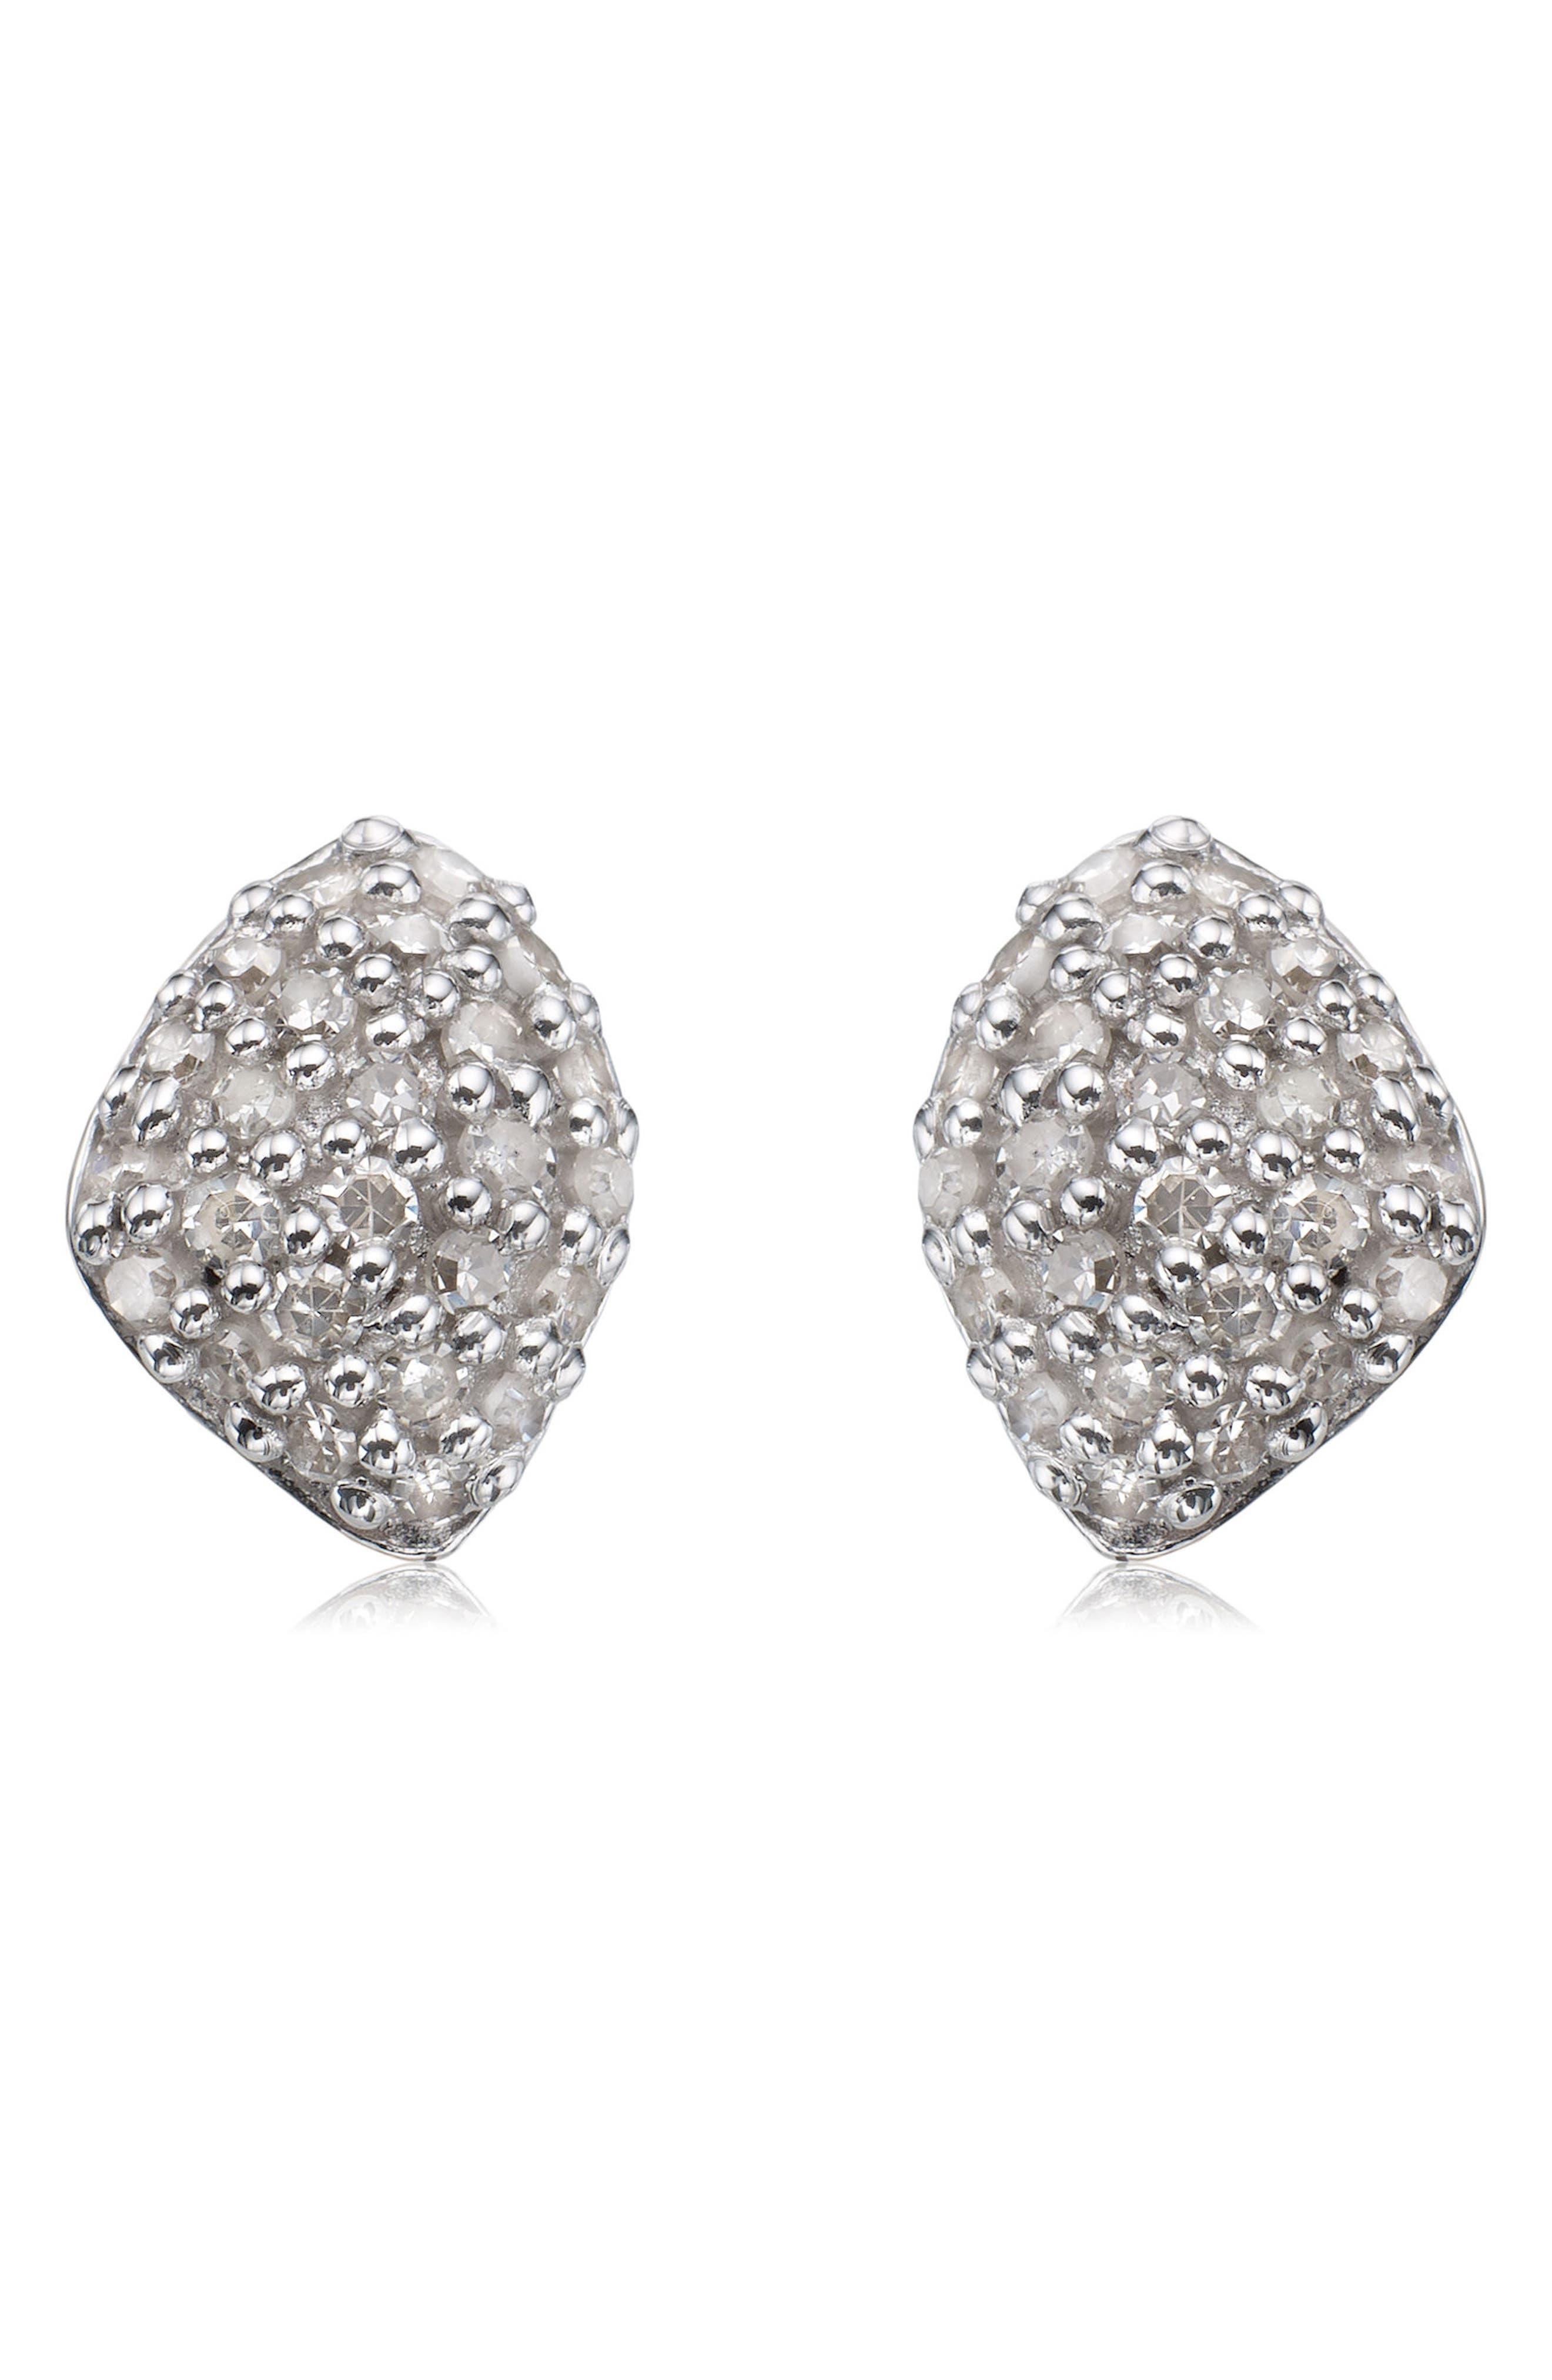 MONICA VINADER, Nura Mini Diamond Stud Earrings, Main thumbnail 1, color, ROSE GOLD/ DIAMOND